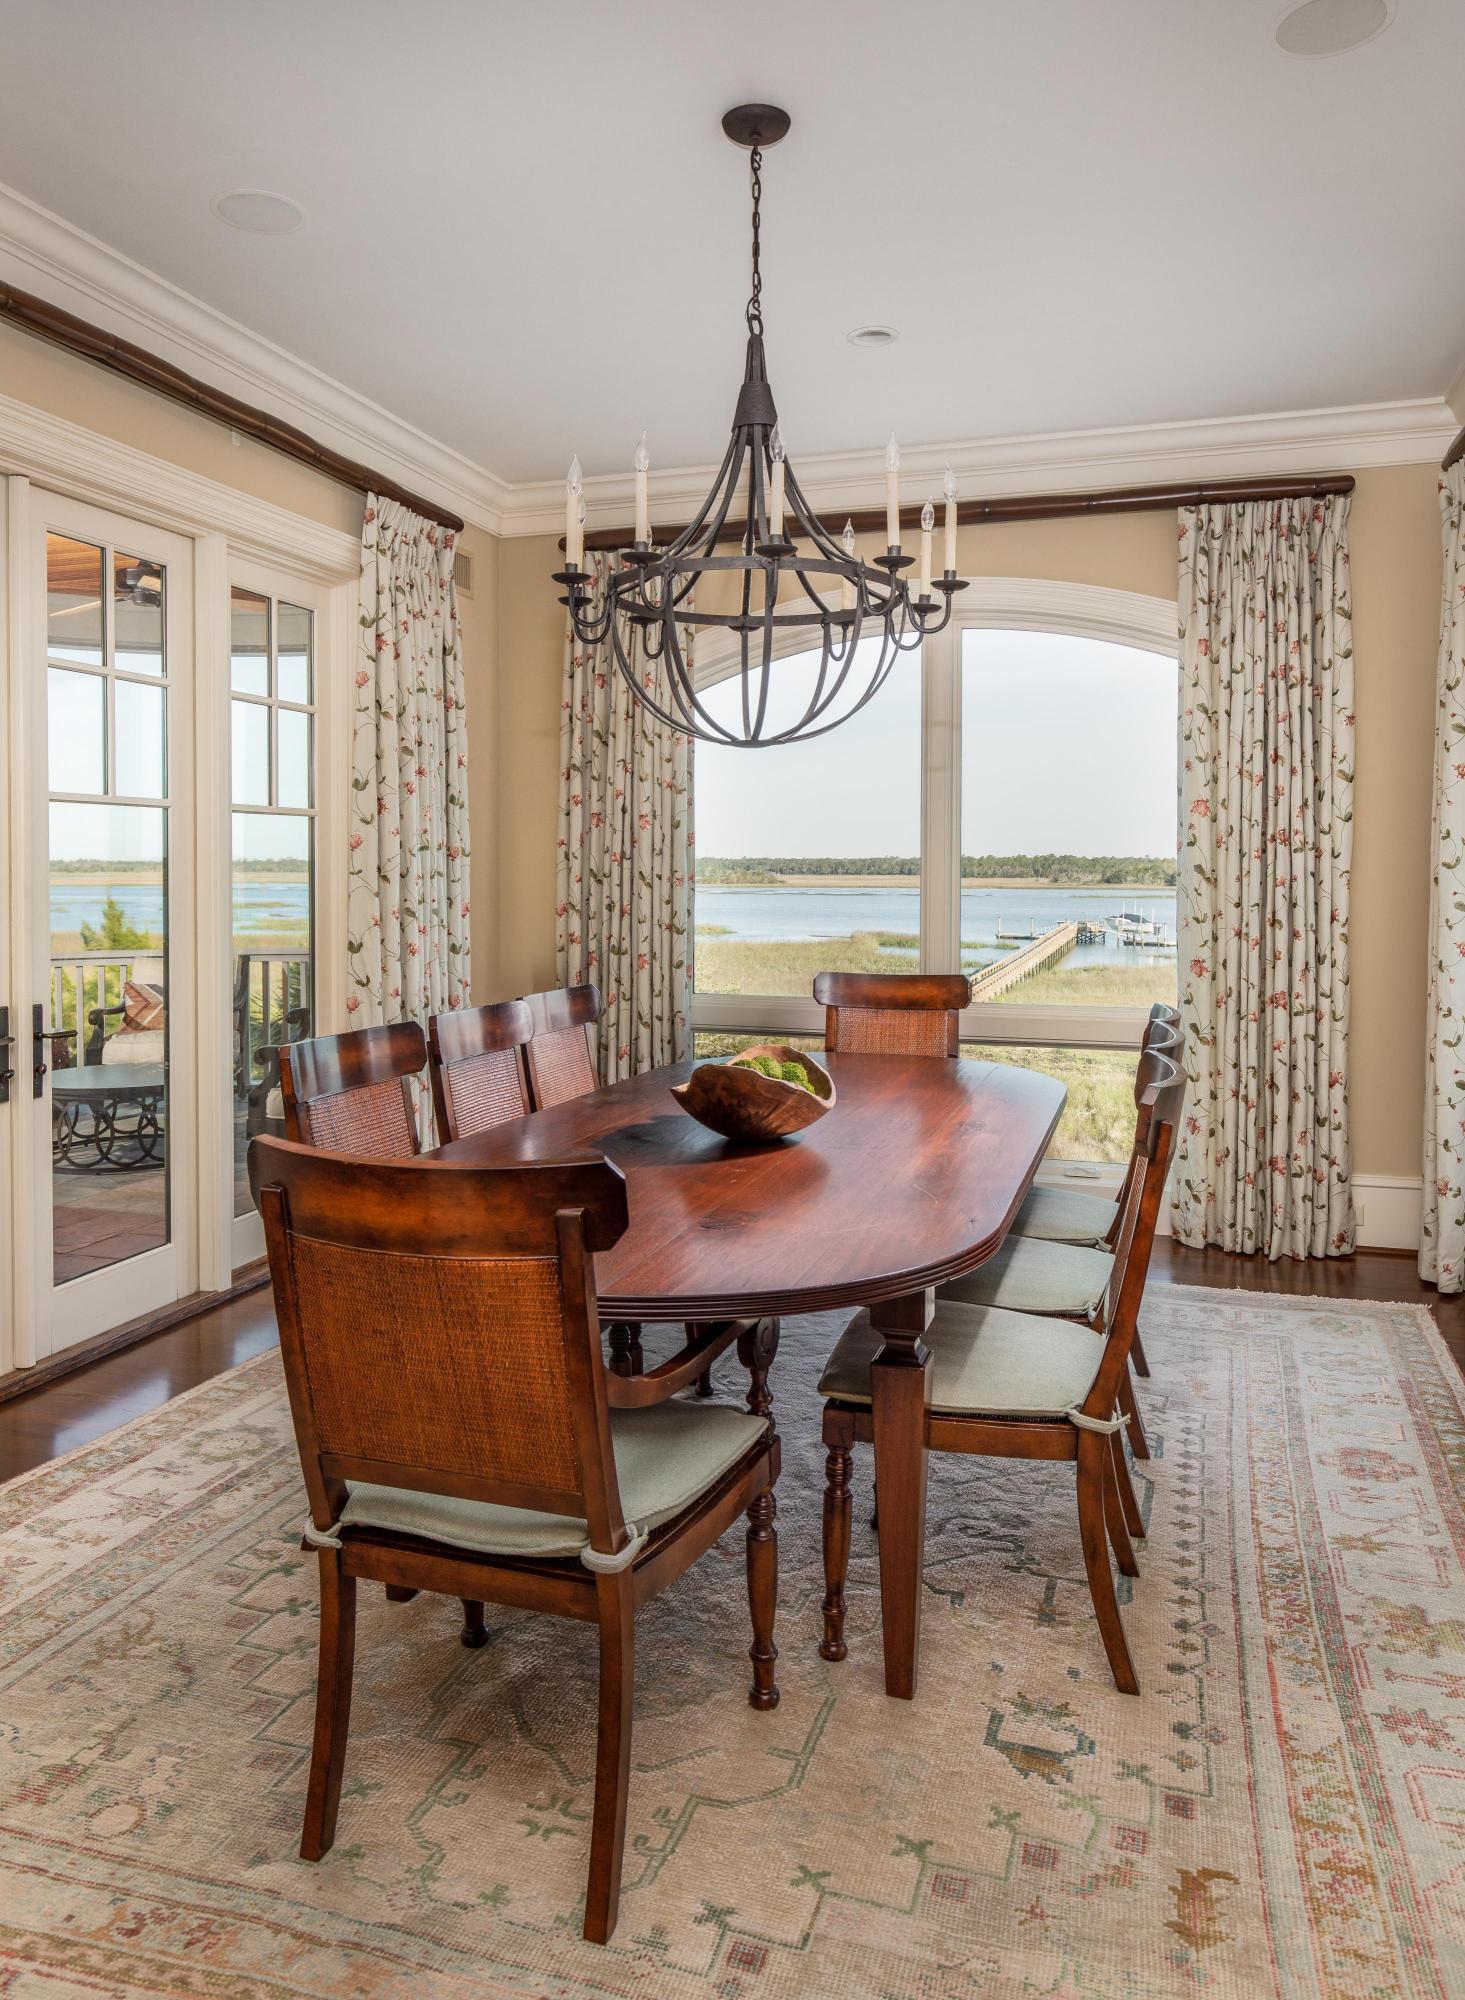 Rhetts Bluff Homes For Sale - 51 River Marsh, Kiawah Island, SC - 14